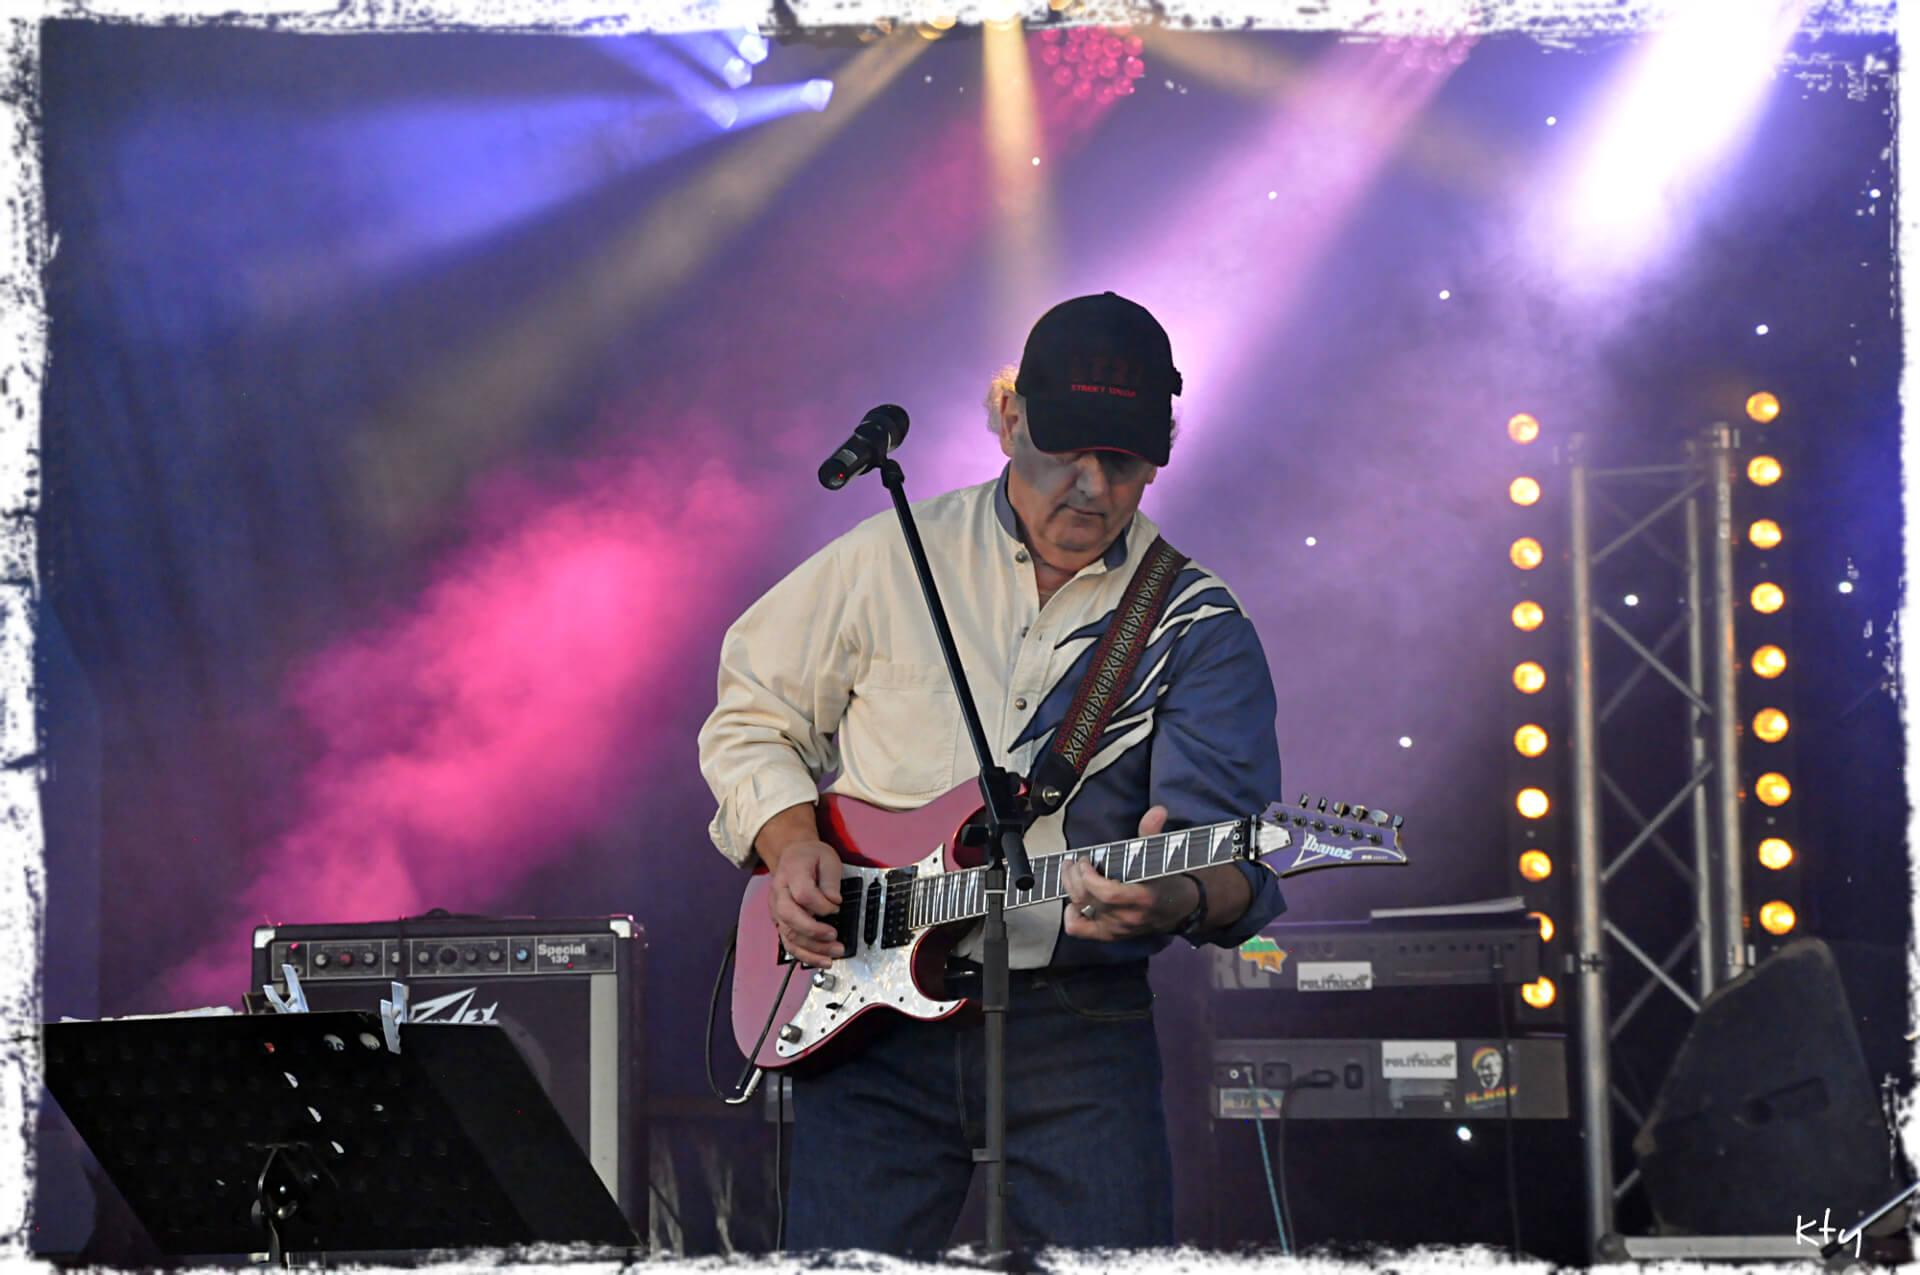 Henry Jaouen Tour Duff 2017